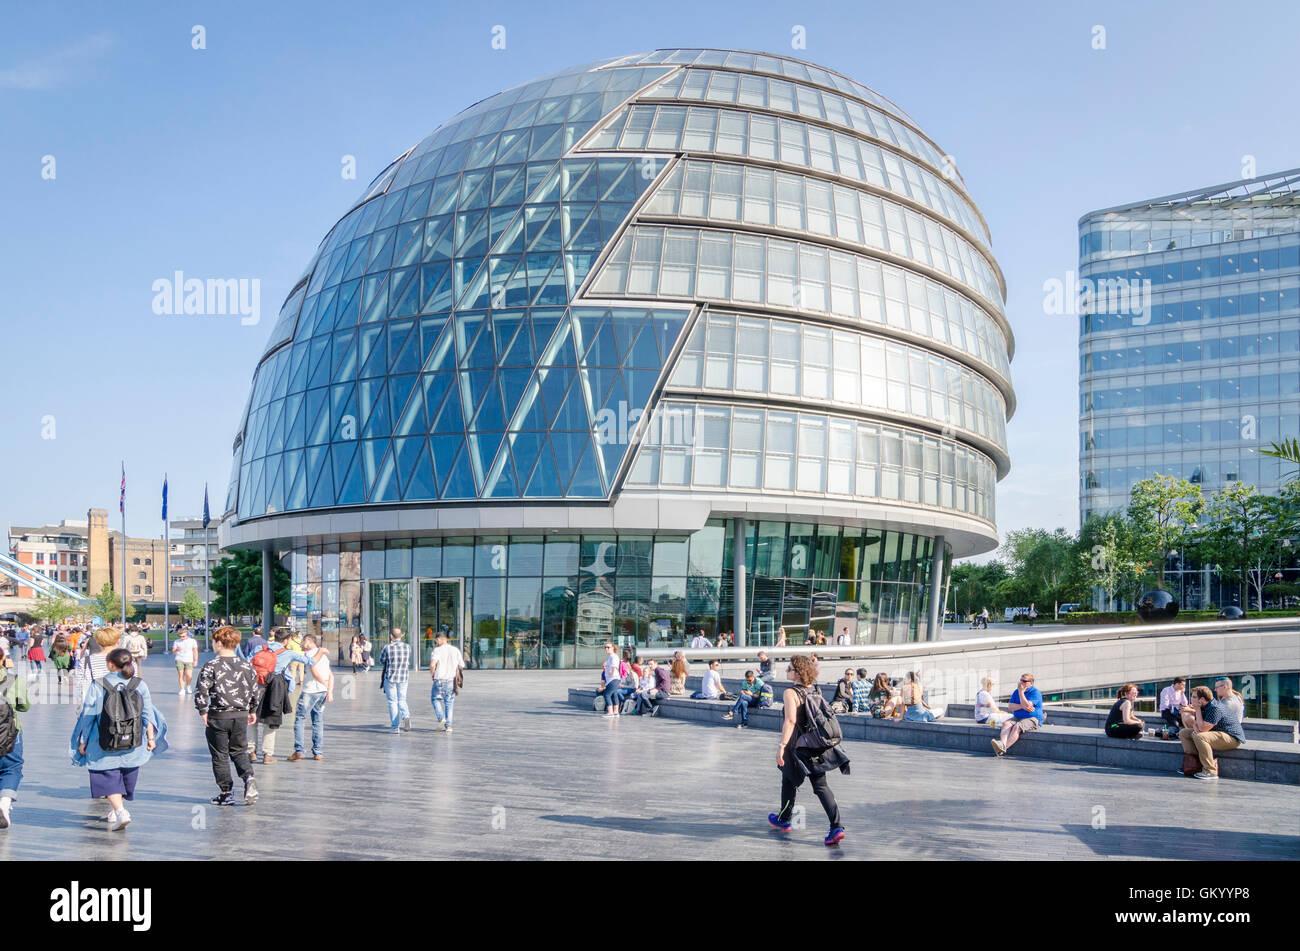 People outside City Hall, London, UK - Stock Image